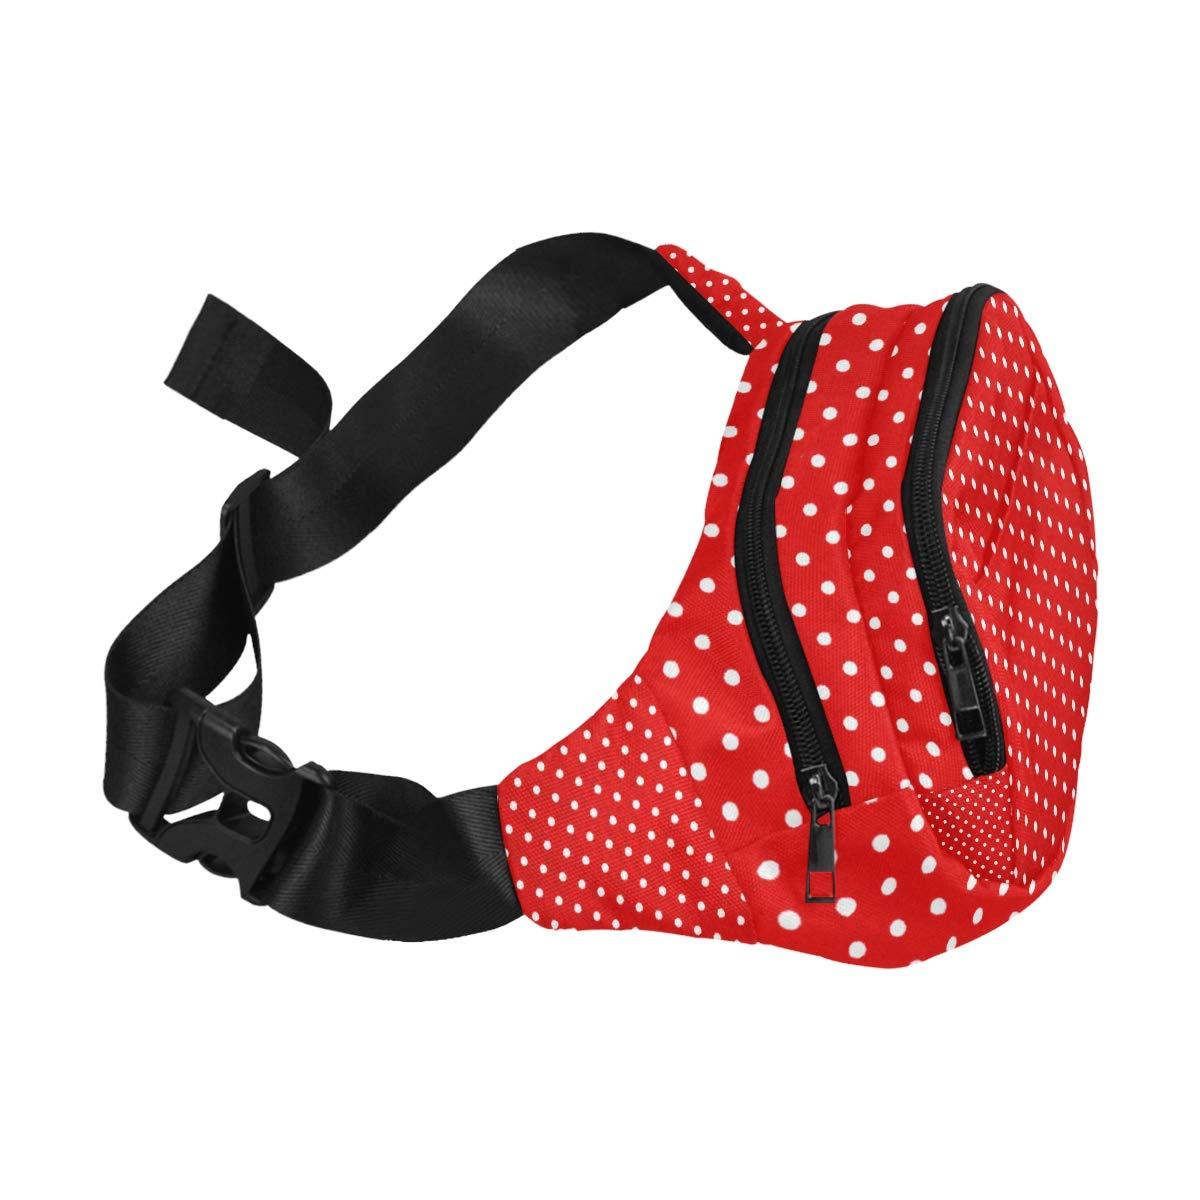 Girlish Red And White Polka Dots Fenny Packs Waist Bags Adjustable Belt Waterproof Nylon Travel Running Sport Vacation Party For Men Women Boys Girls Kids